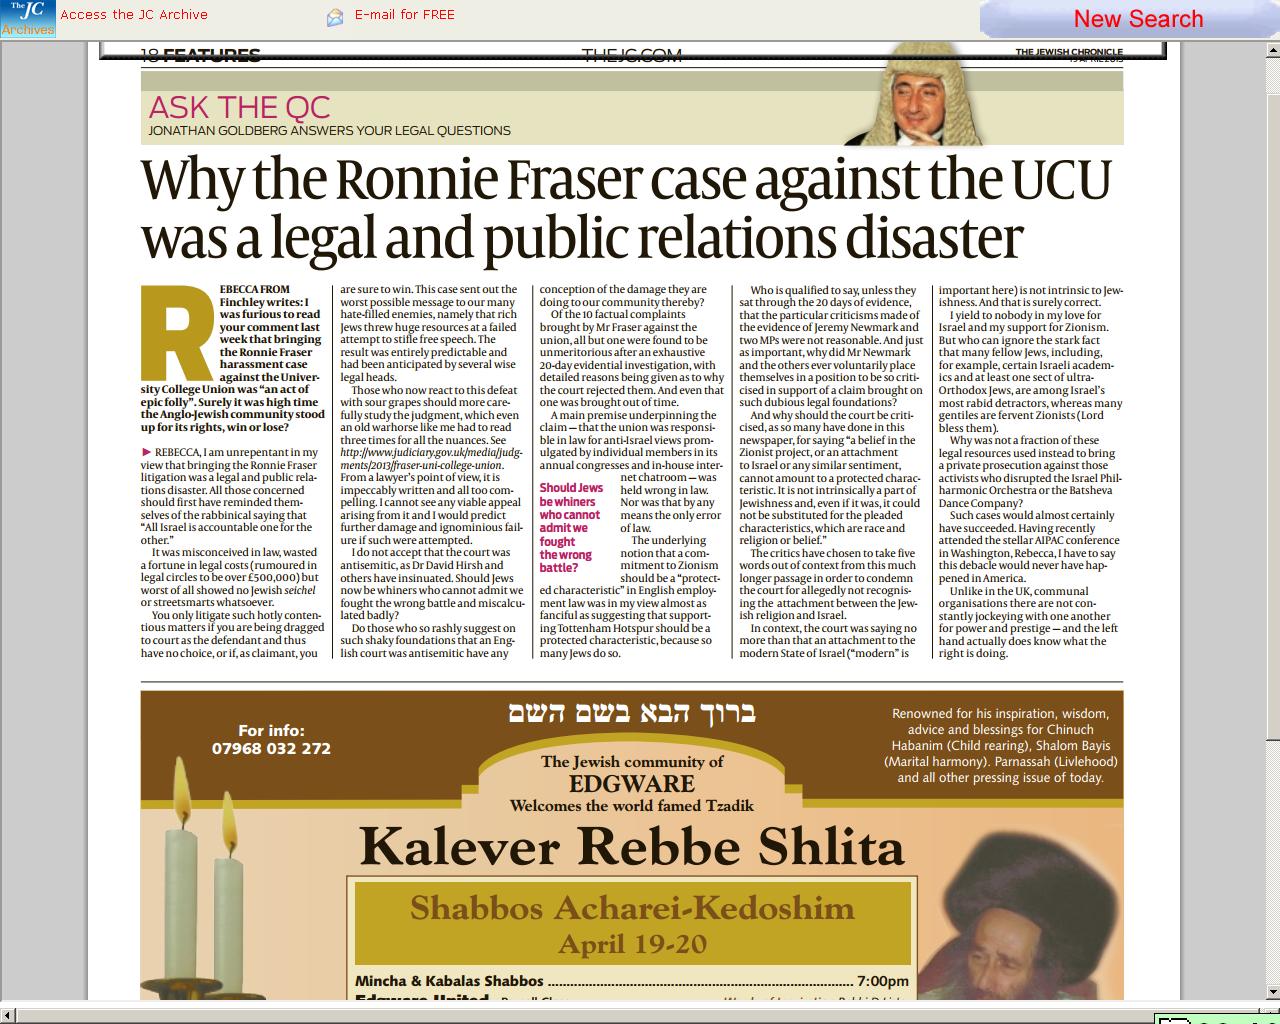 Jews sans frontieres: False Allegation of FUCU Tribunal's